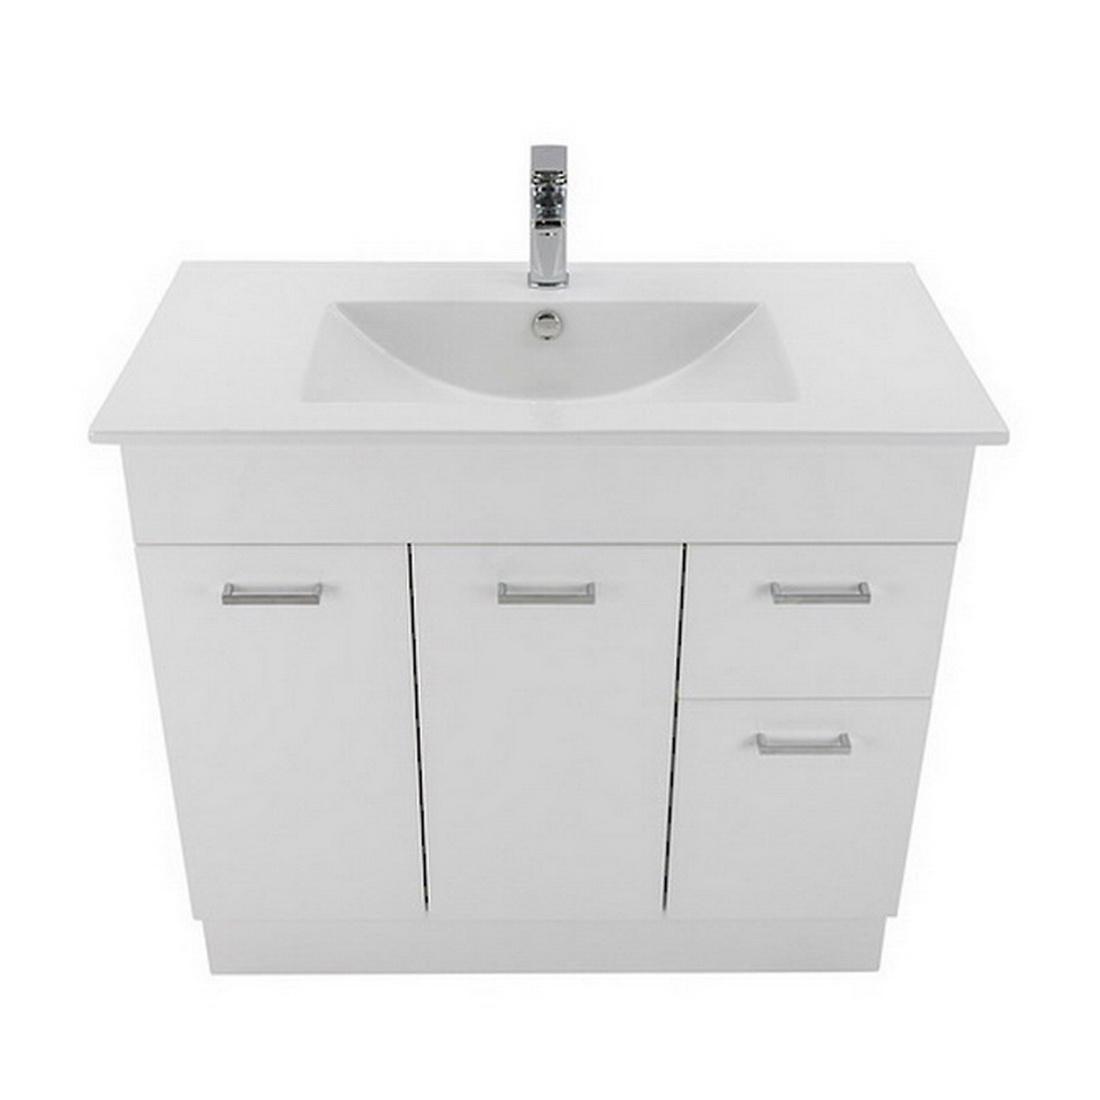 Newtech Montana Qube 2 Drawer Floorstanding Vanity 900 x 820 x 460 mm Gloss White 3475